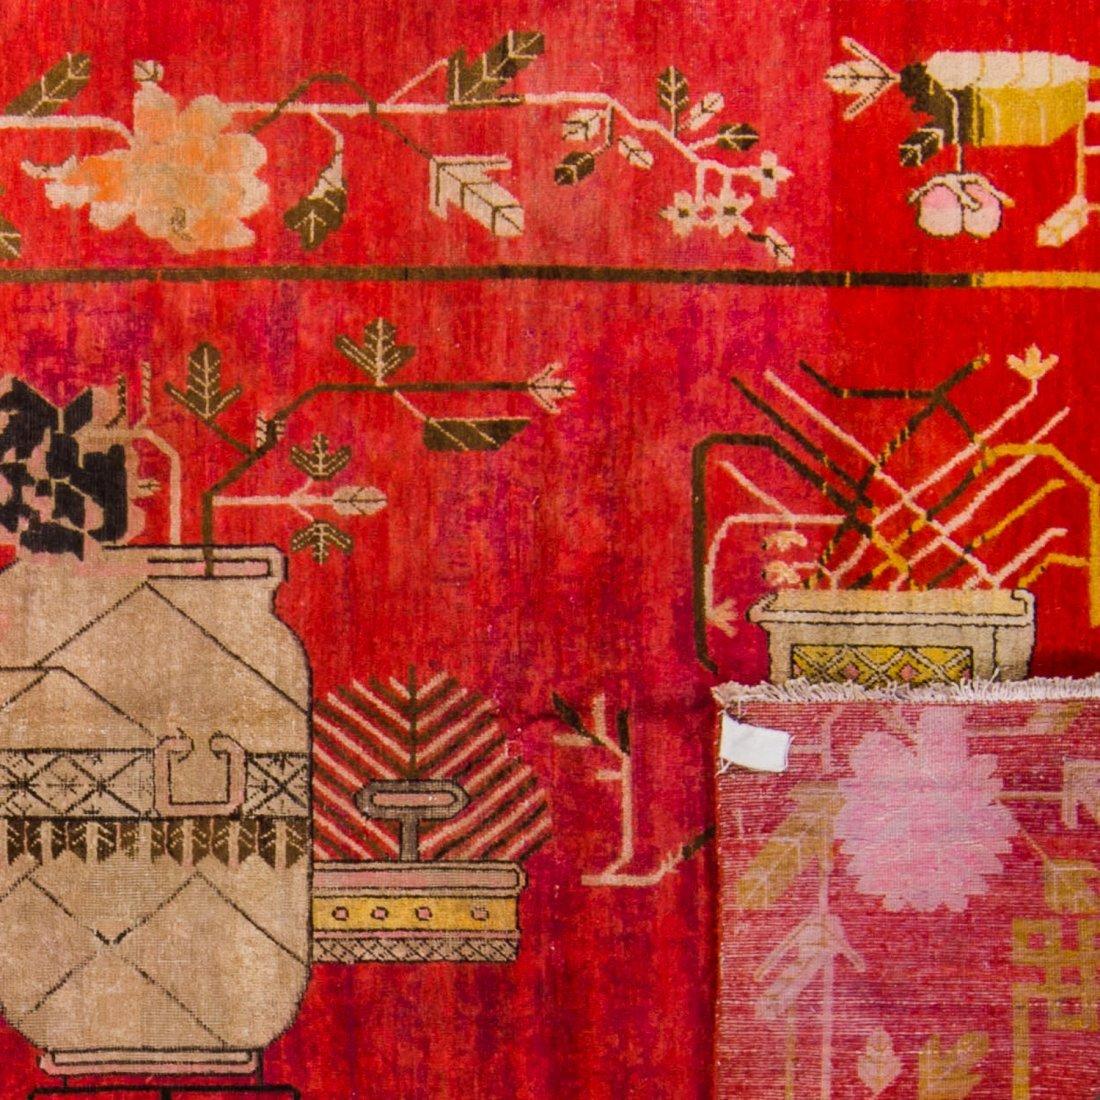 Antique Samarkand Rug: 5'11'' x 11'6'' - 2